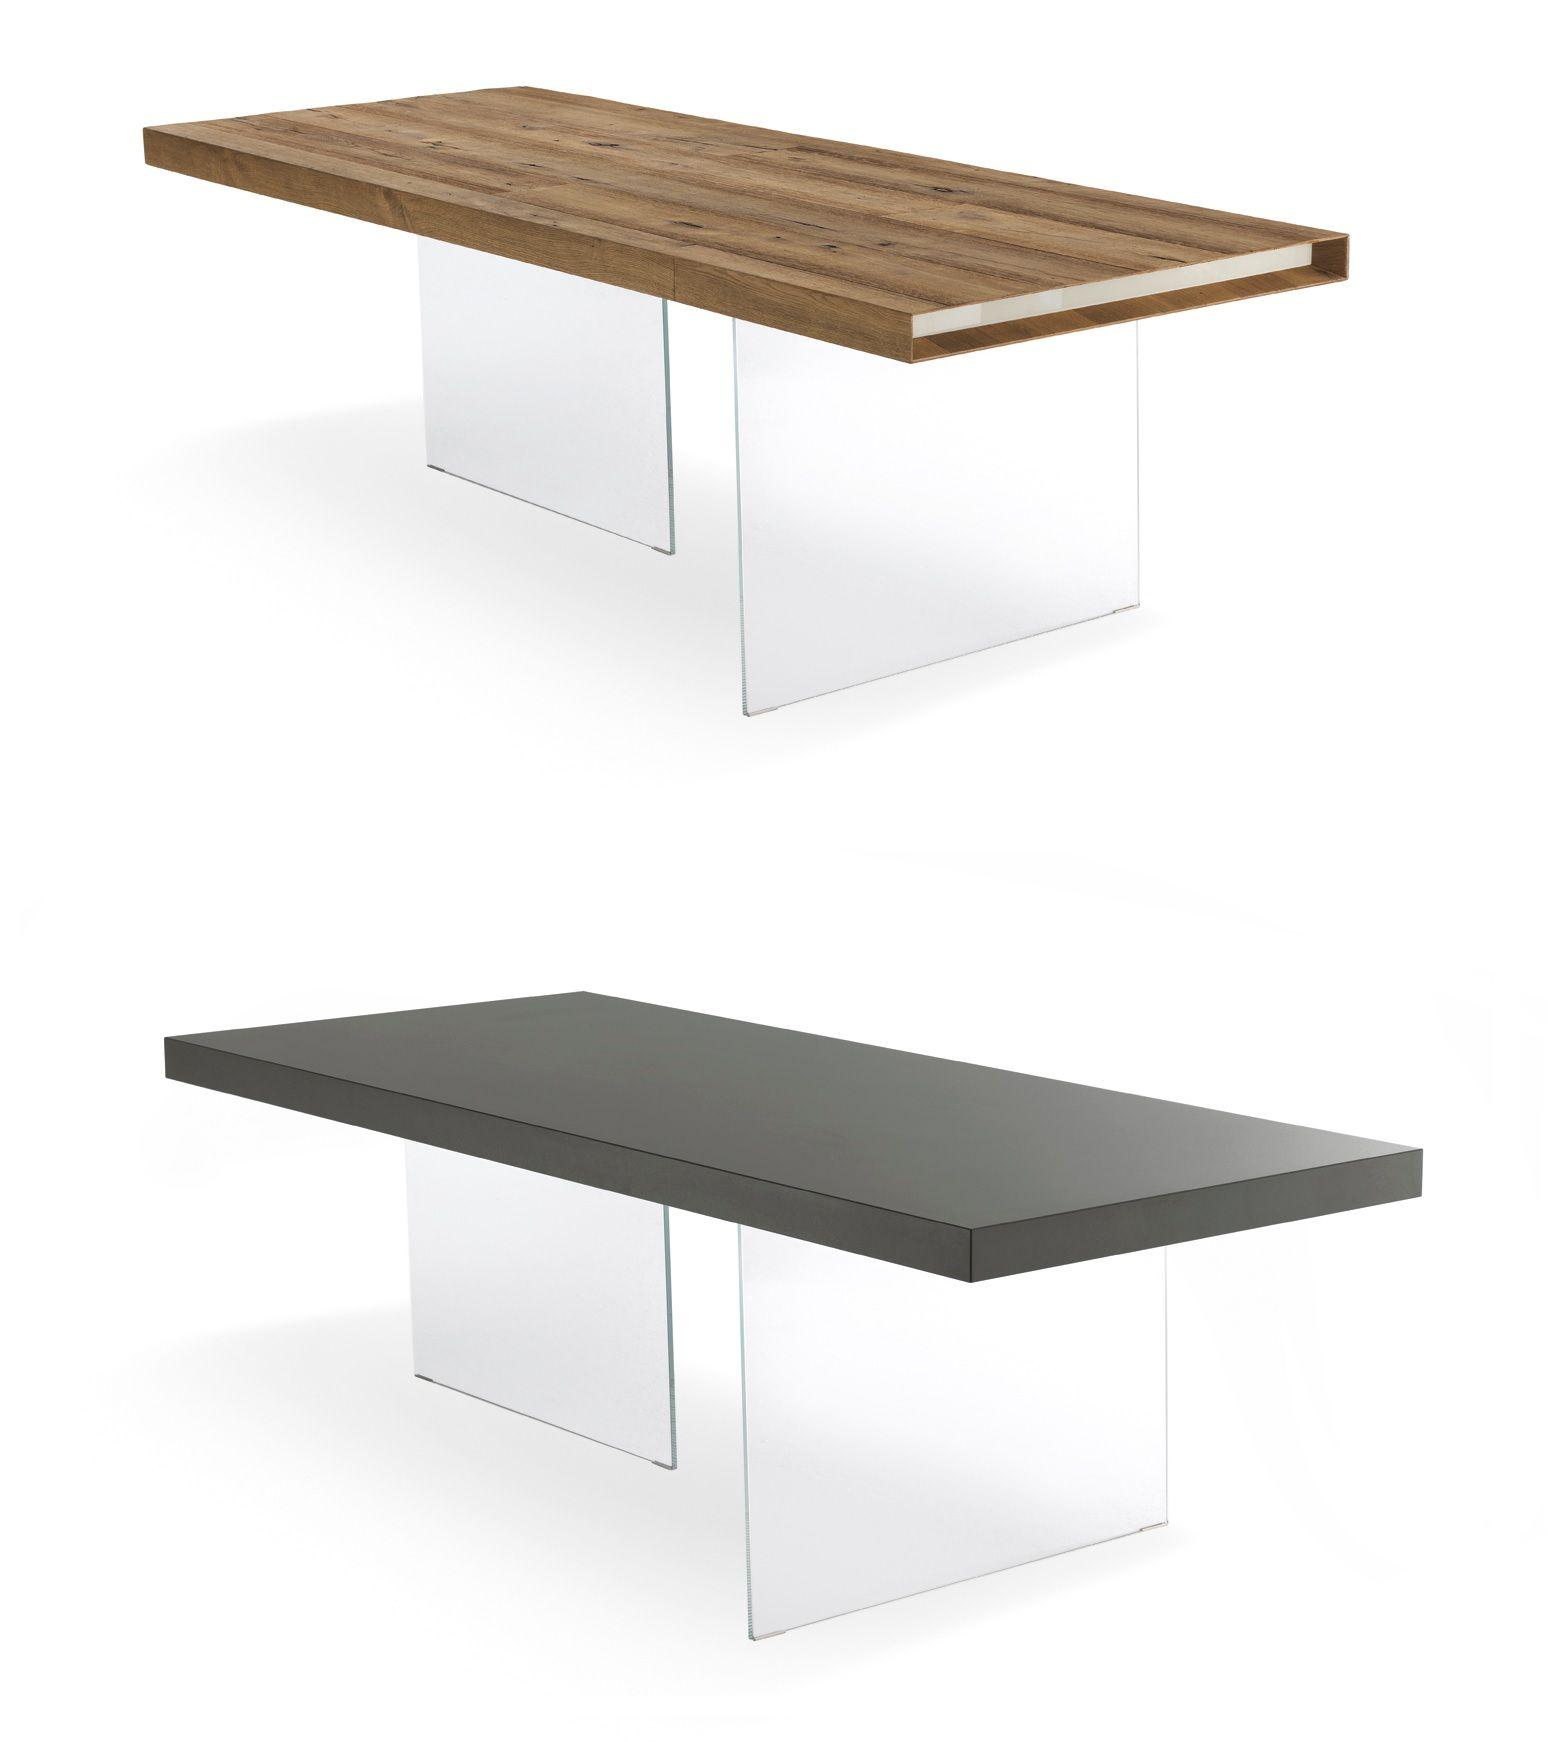 Air Table by LAGO Design by Daniele Lago